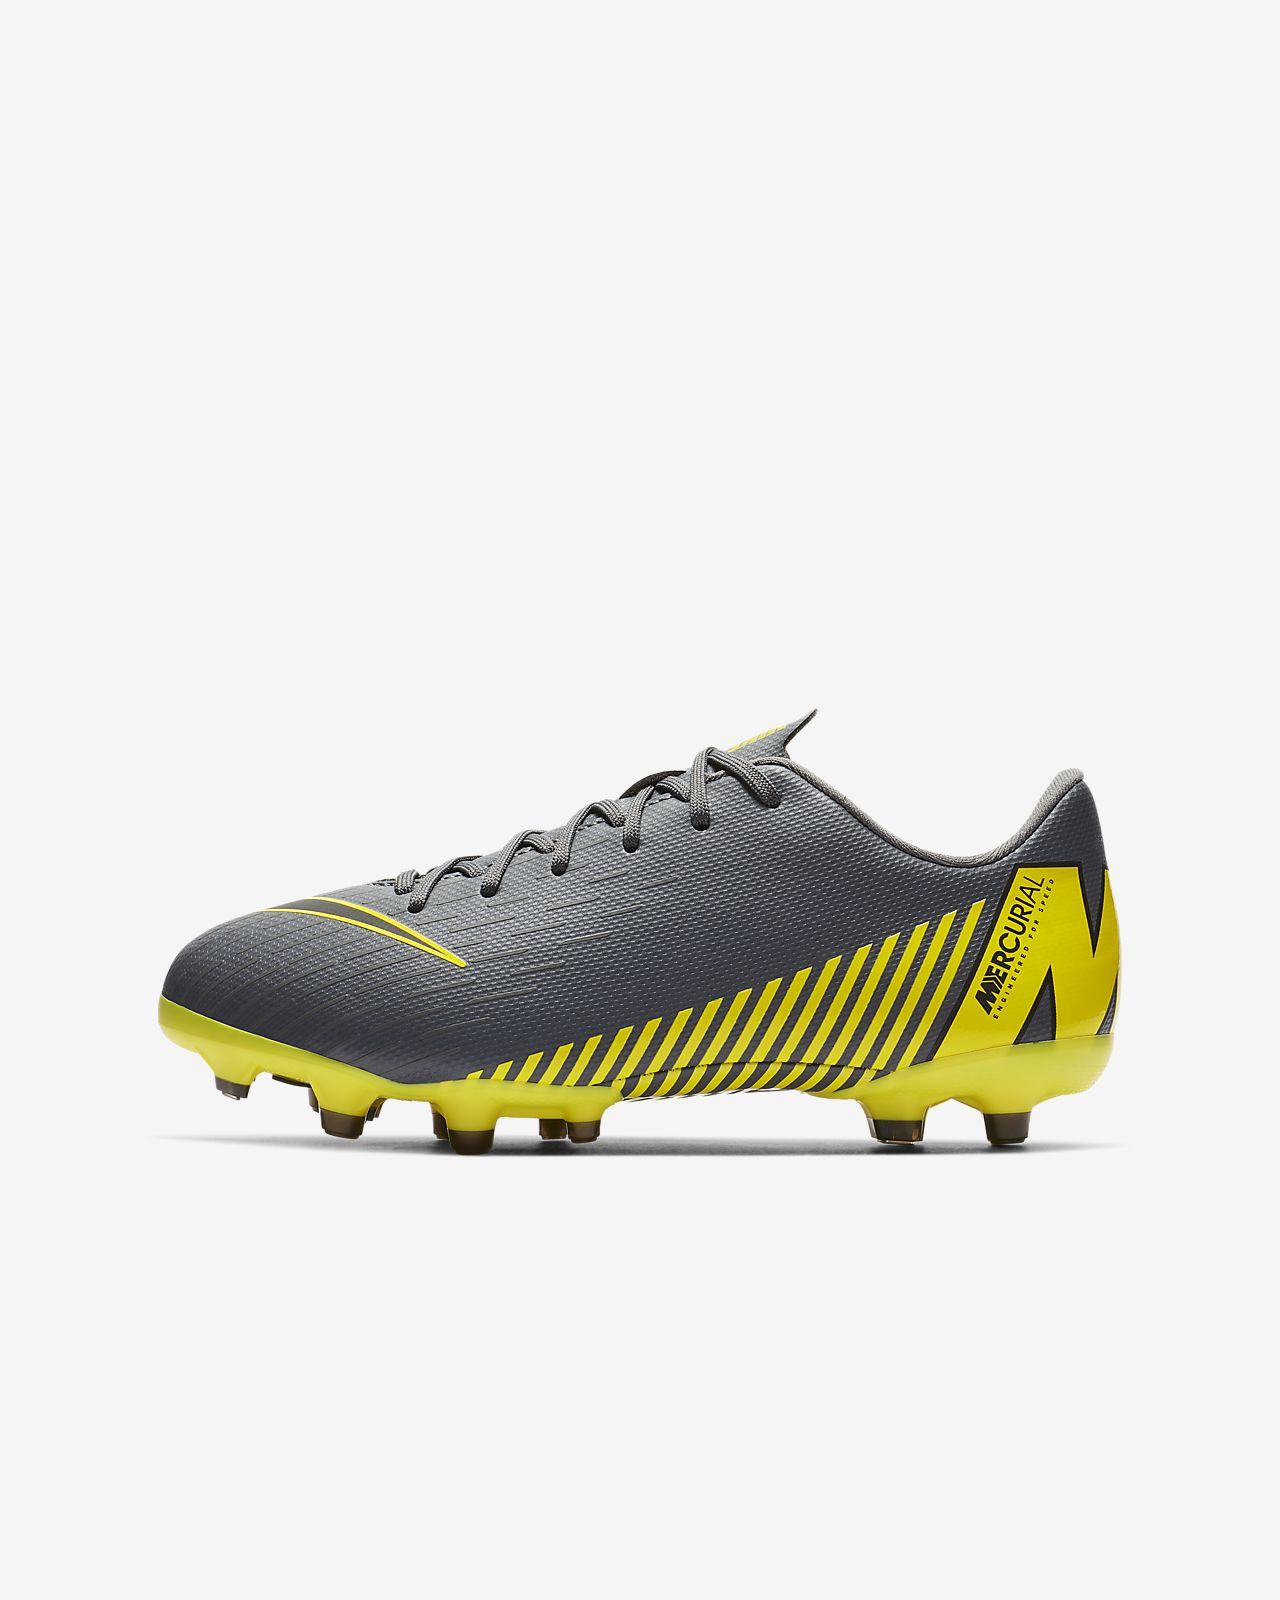 22be53eece549 ... Nike Jr. Mercurial Vapor XII Academy Botas de fútbol para múltiples  superficies - Niño